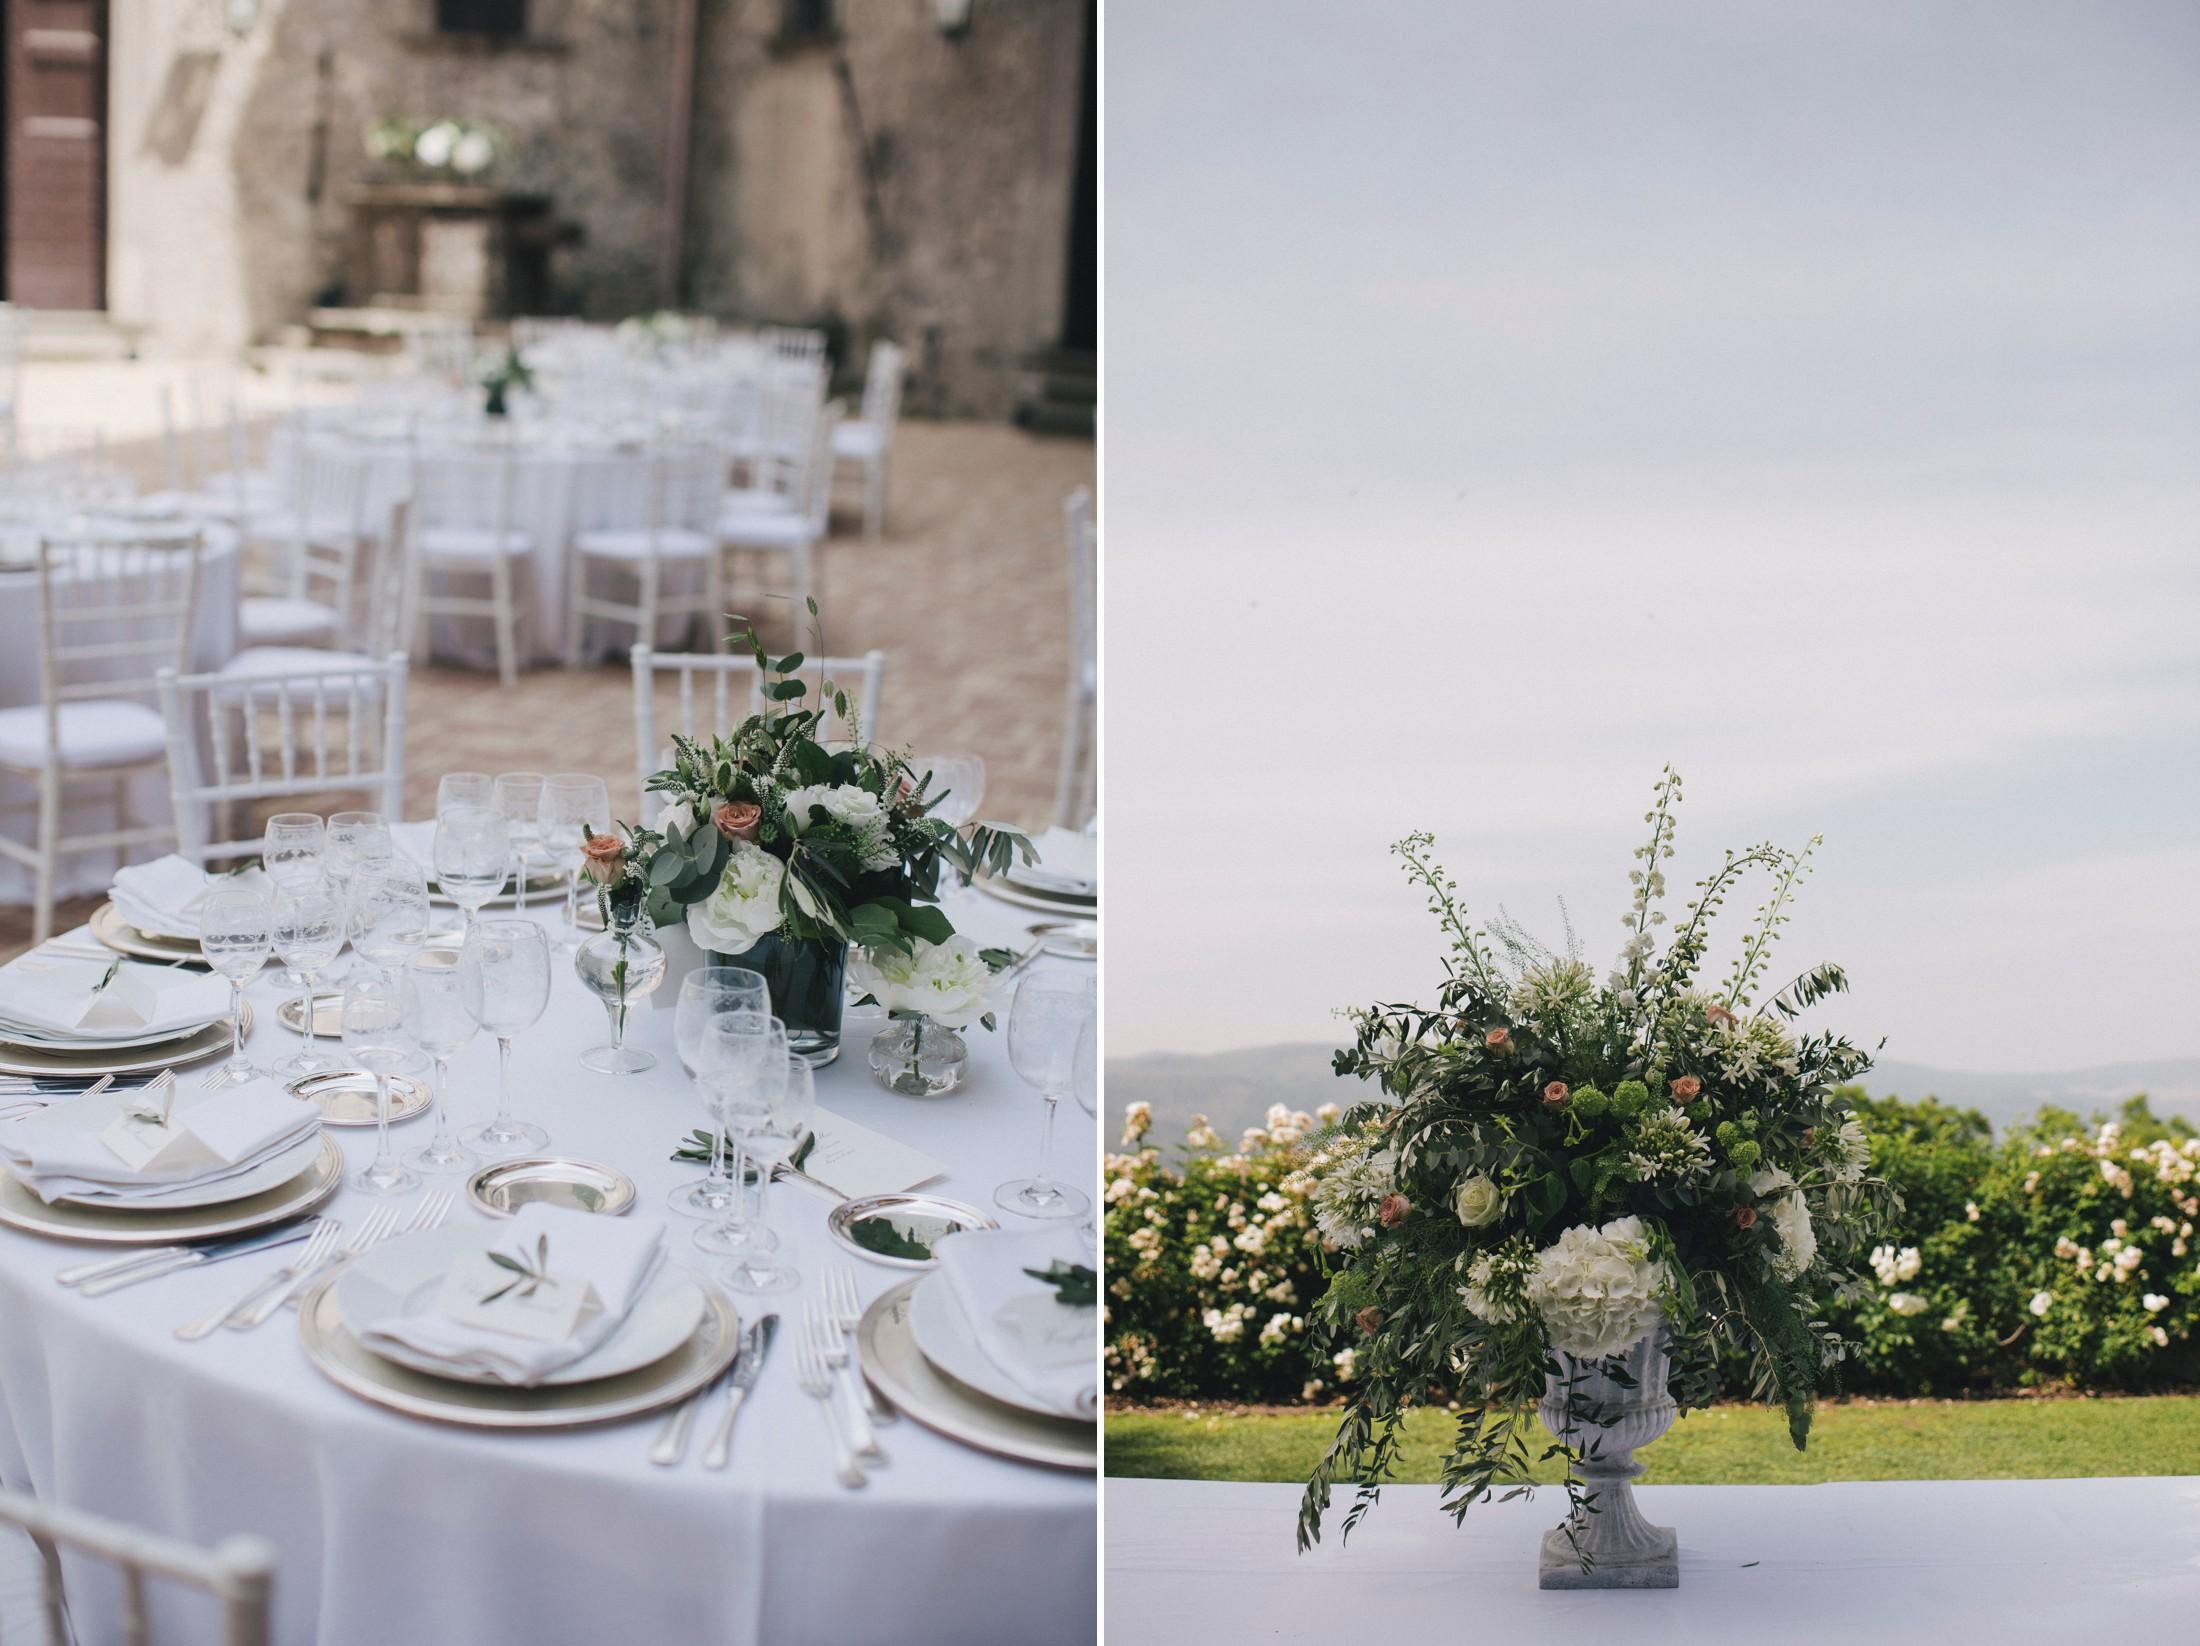 wedding in rome table decor